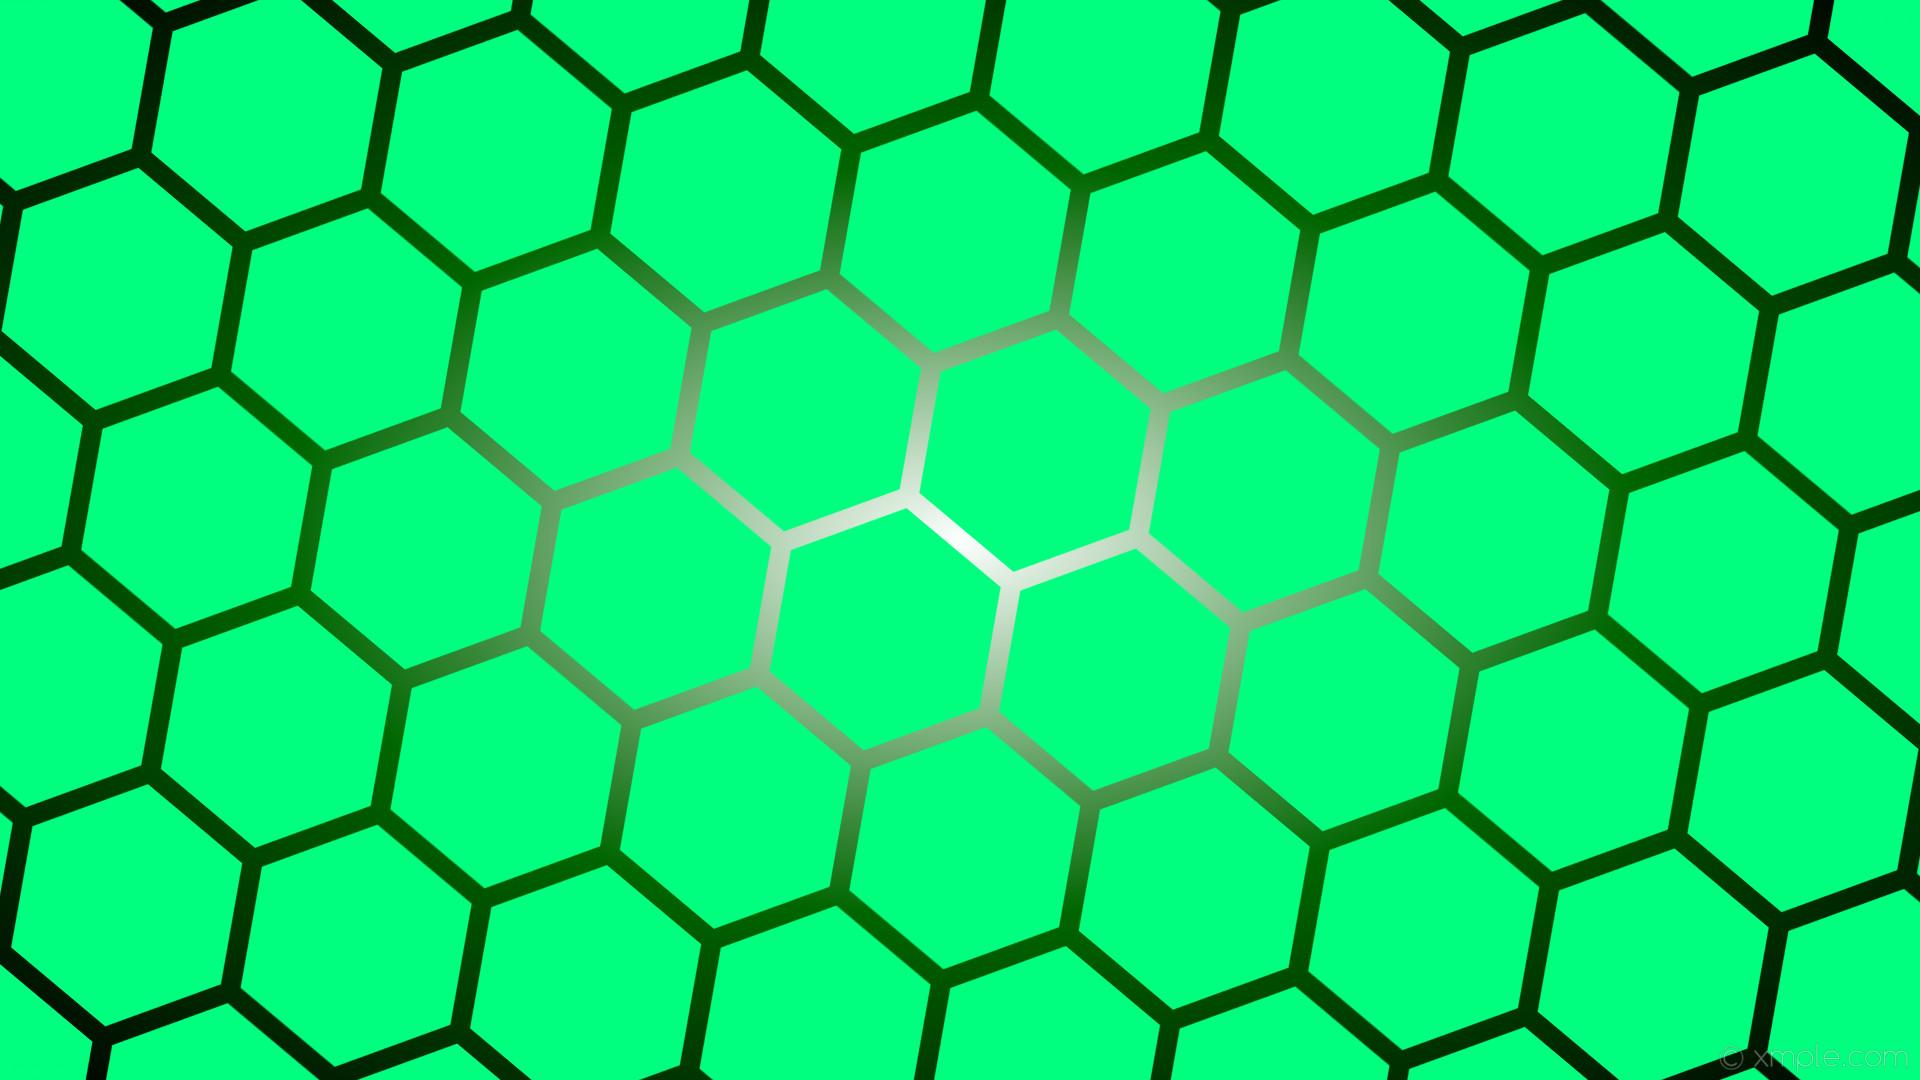 Res: 1920x1080, wallpaper green glow gradient hexagon white black spring green dark green  #00ff7f #ffffff #